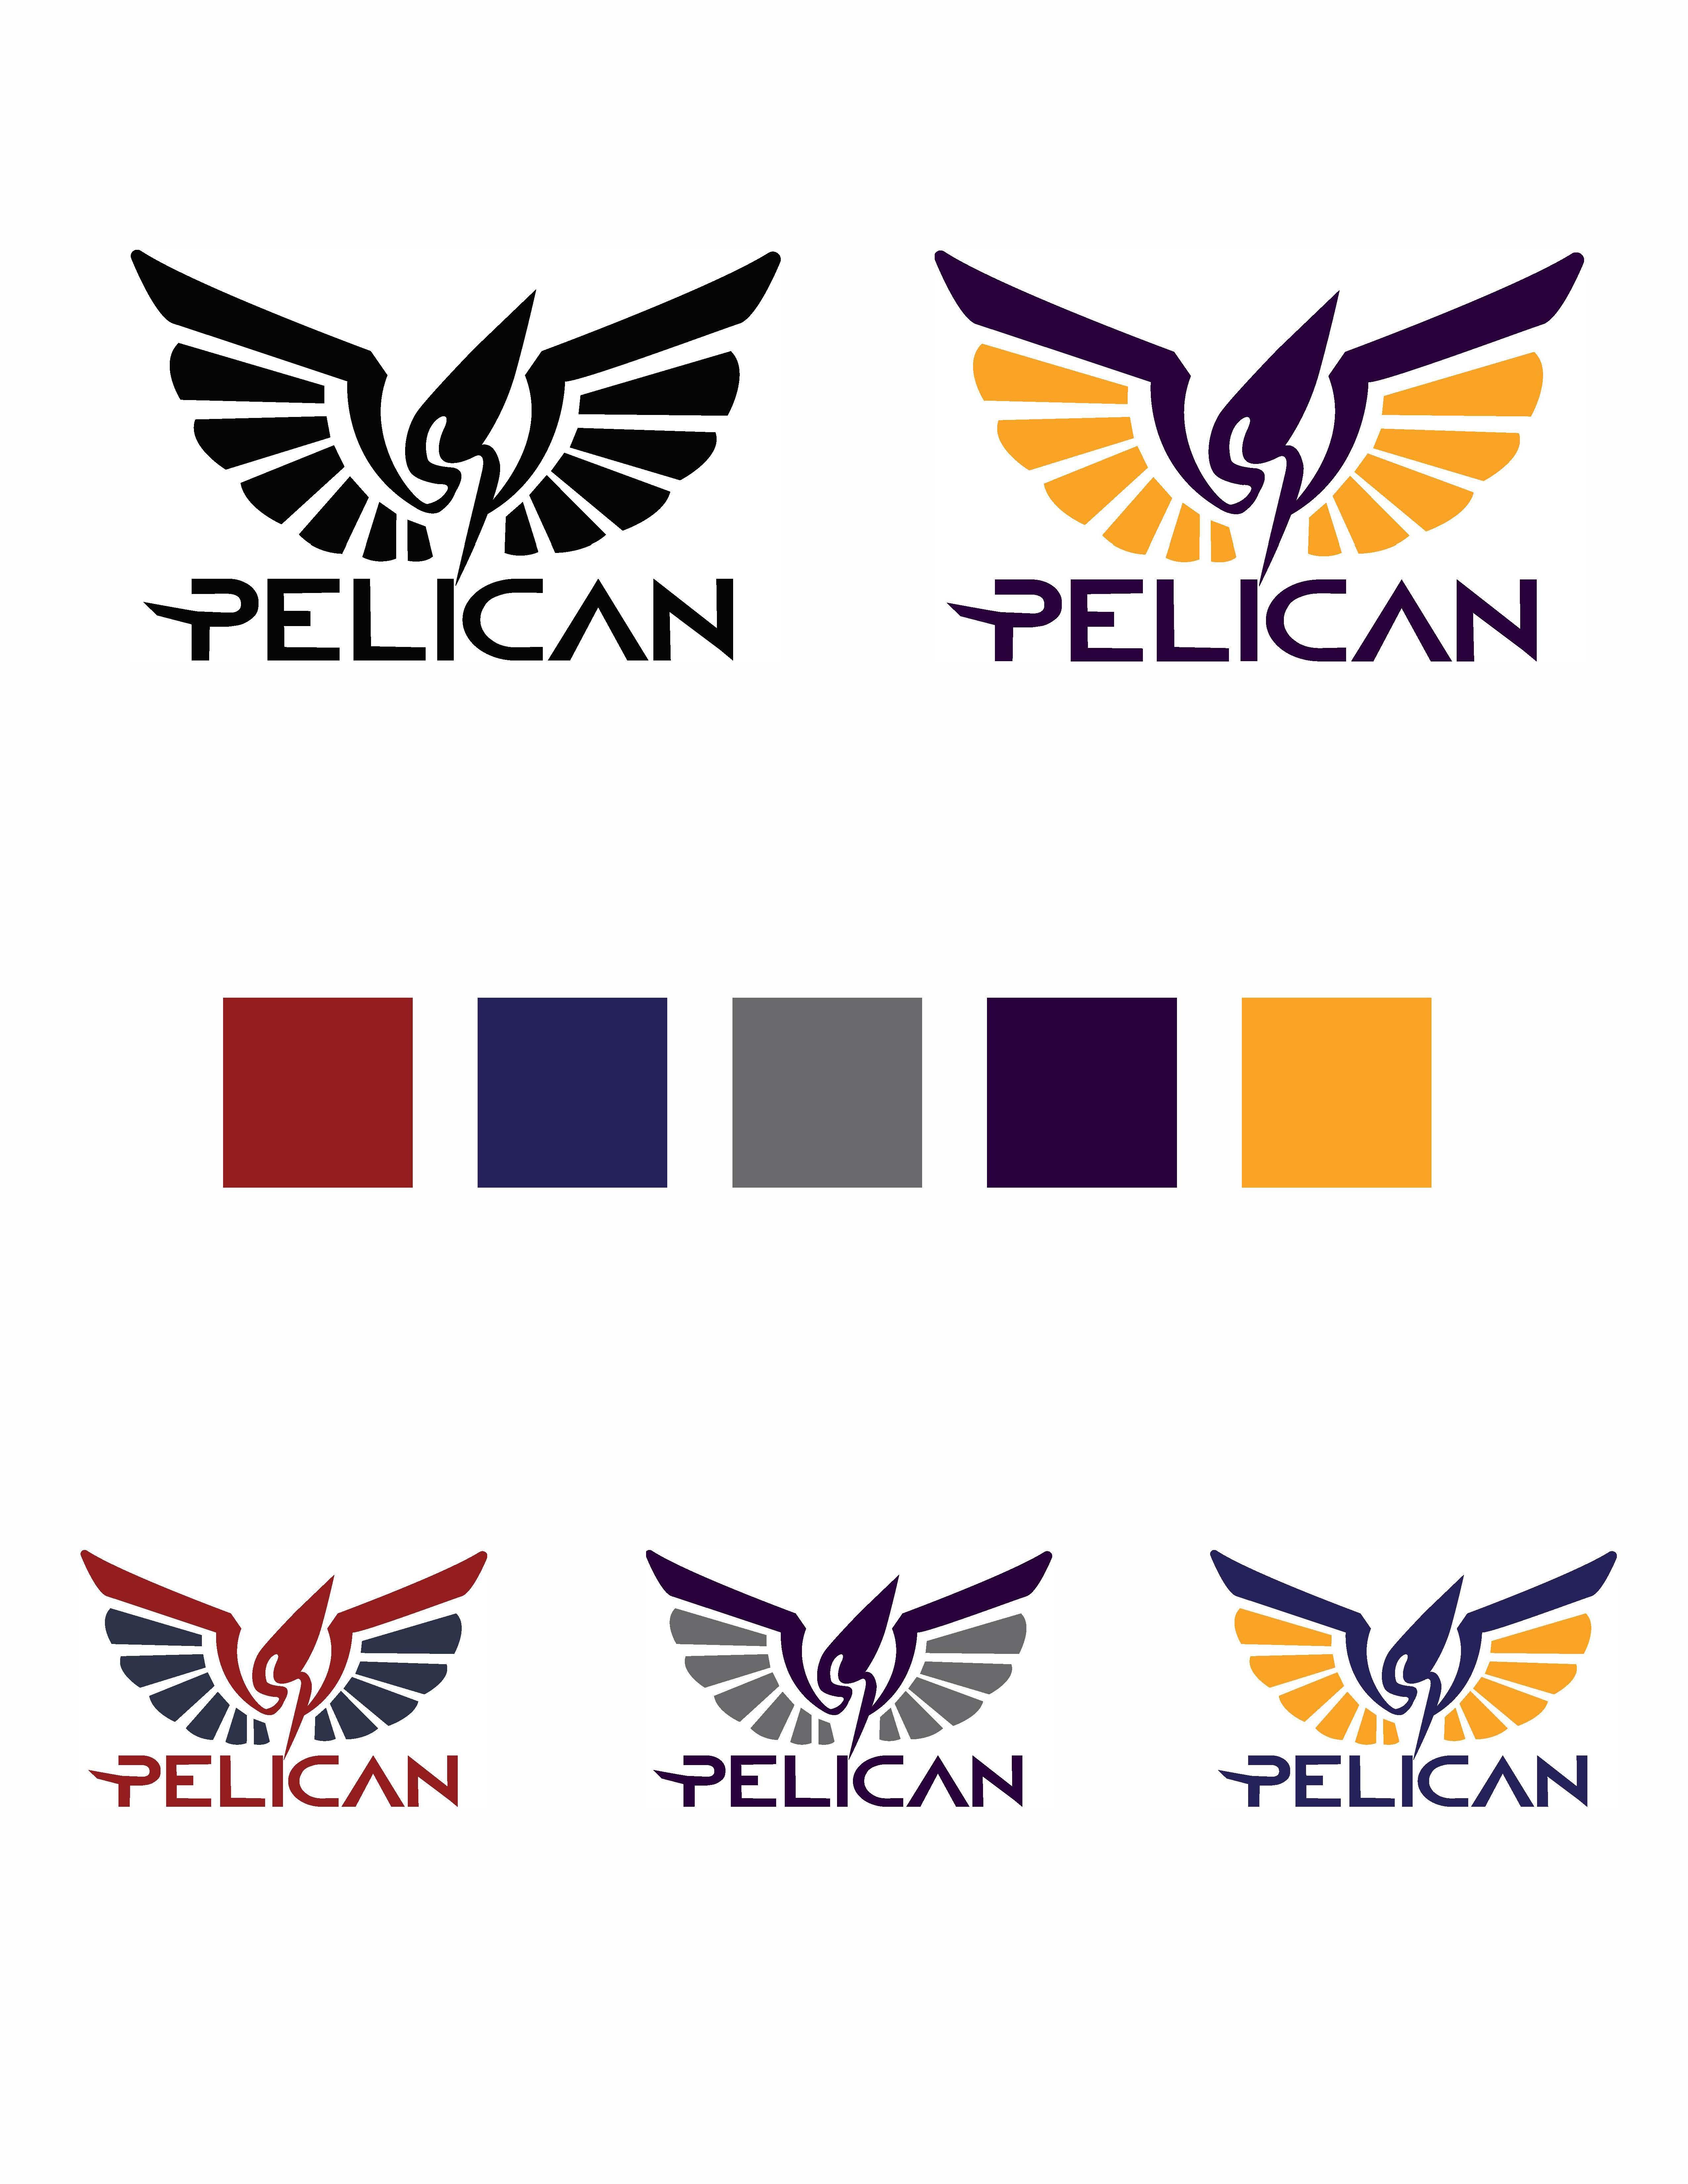 Pelican - New Logo Concept